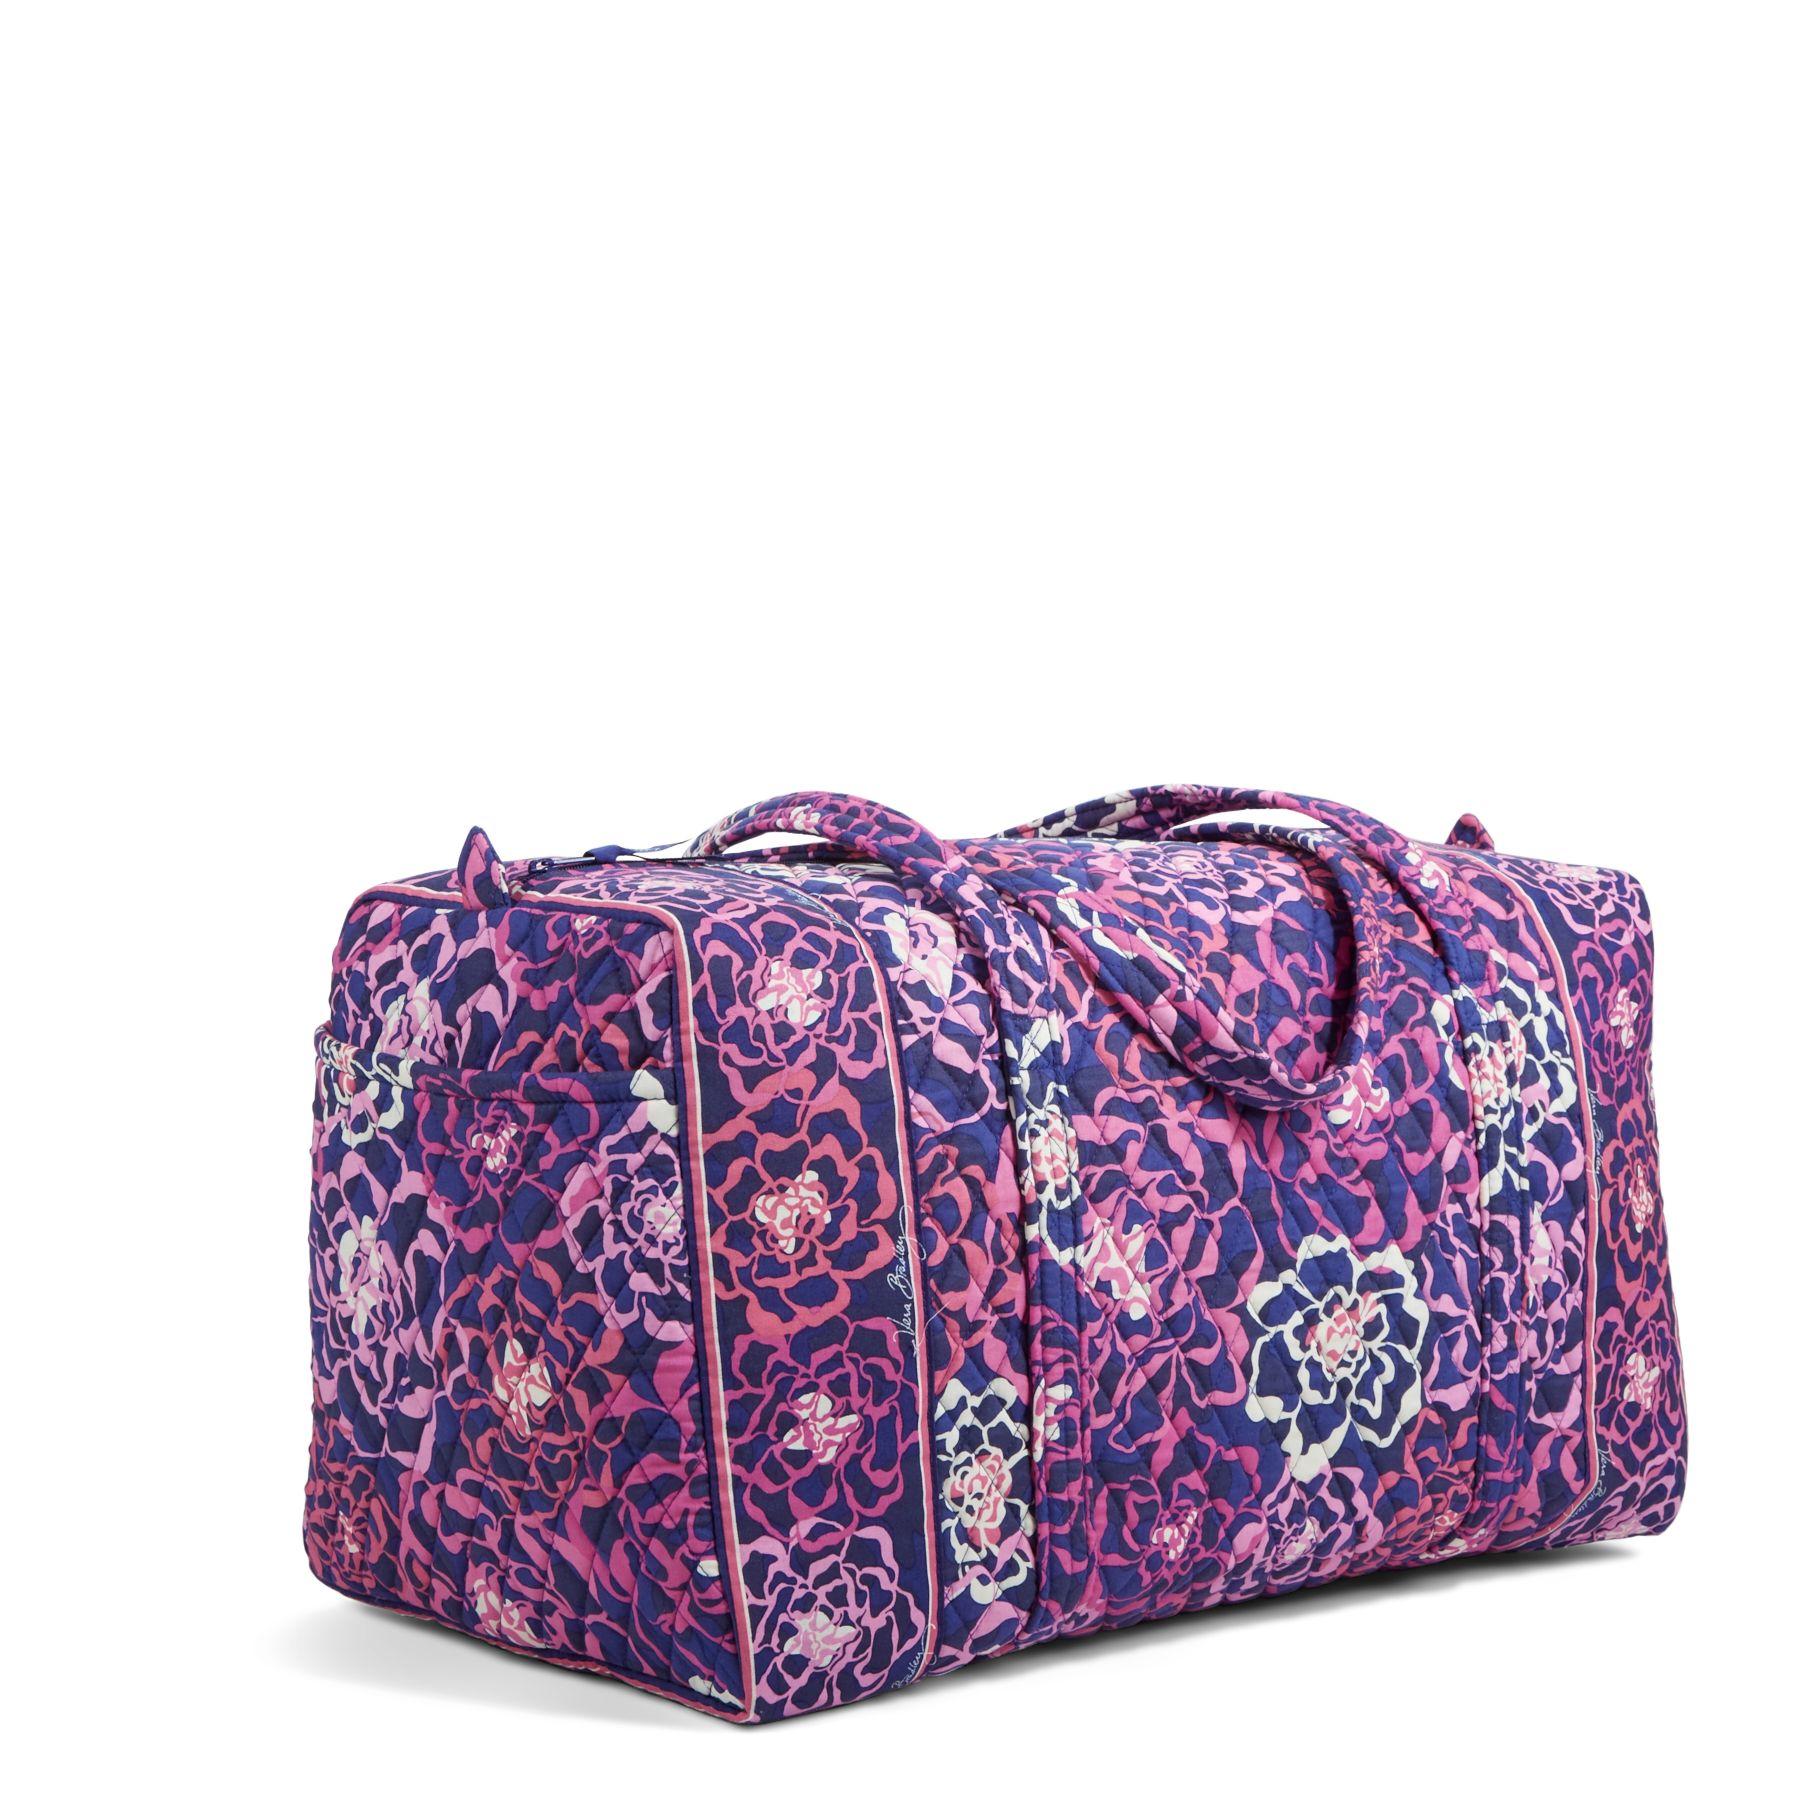 Gym Bag Vera Bradley: Vera Bradley Large Duffel Bag